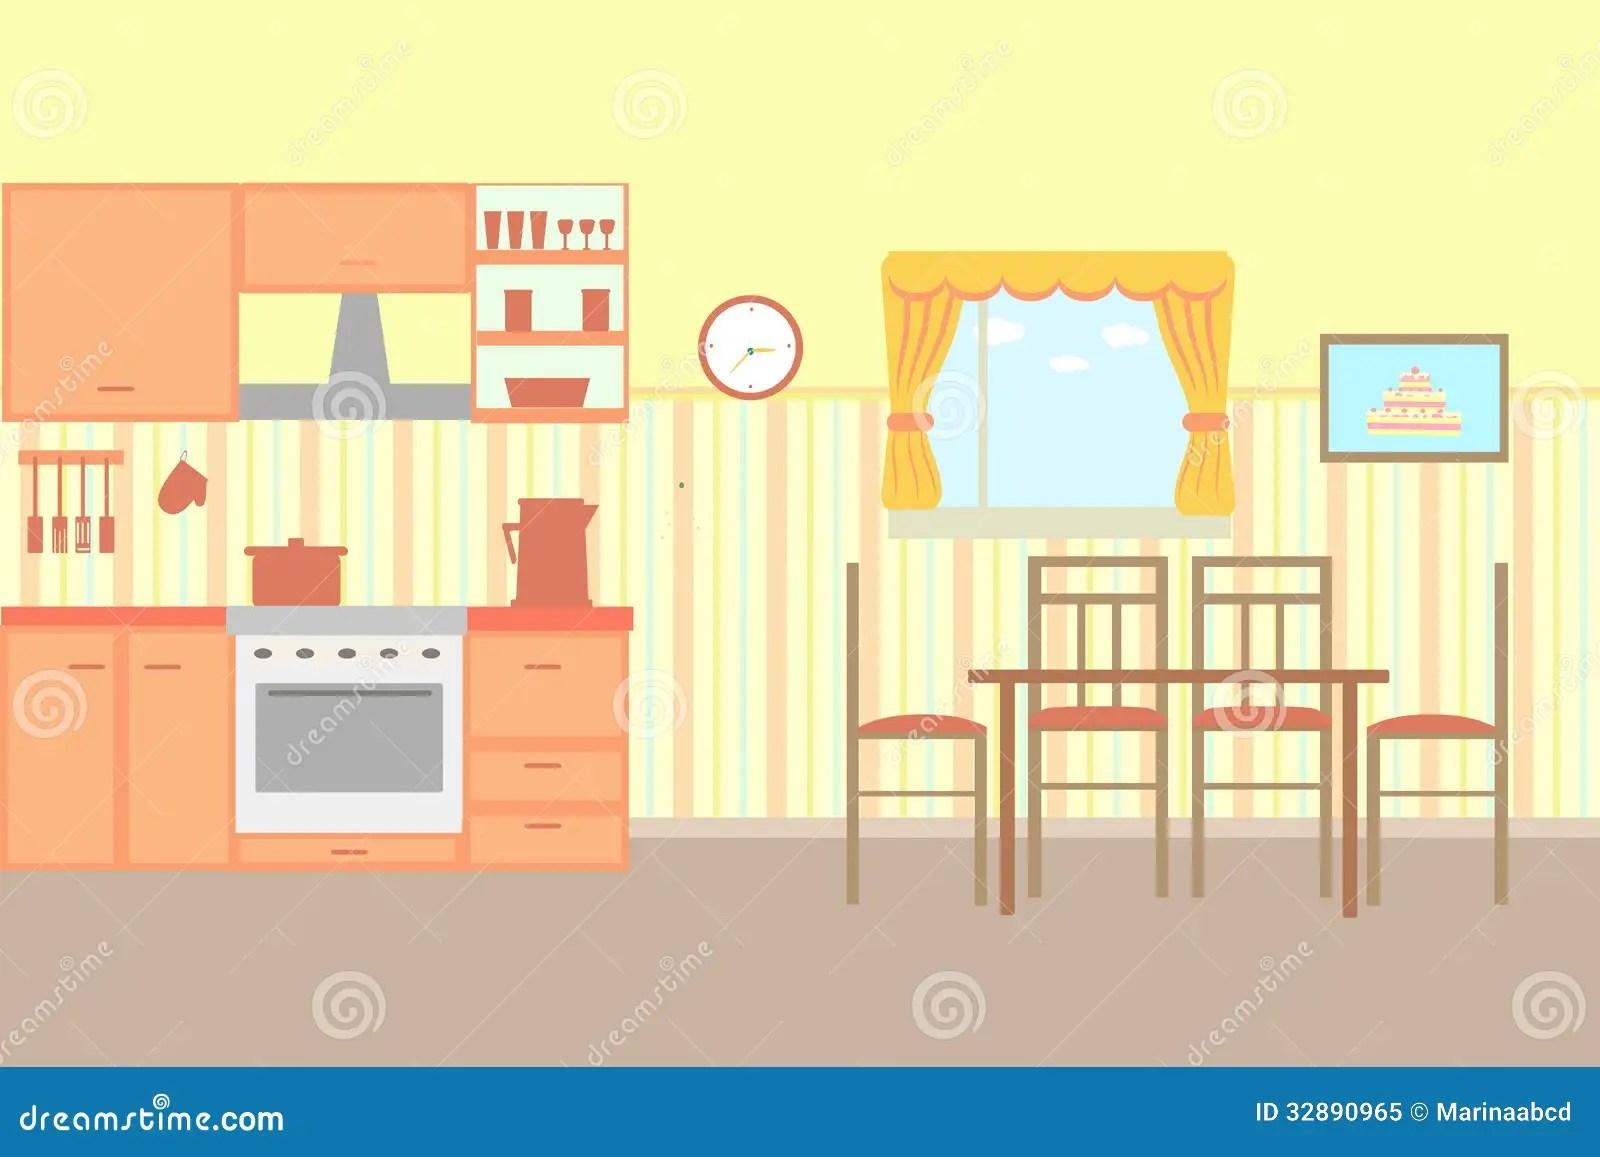 stock photo illustration kitchen kitchen furniture modular kitchen furniture kolkata howrah west bengal price